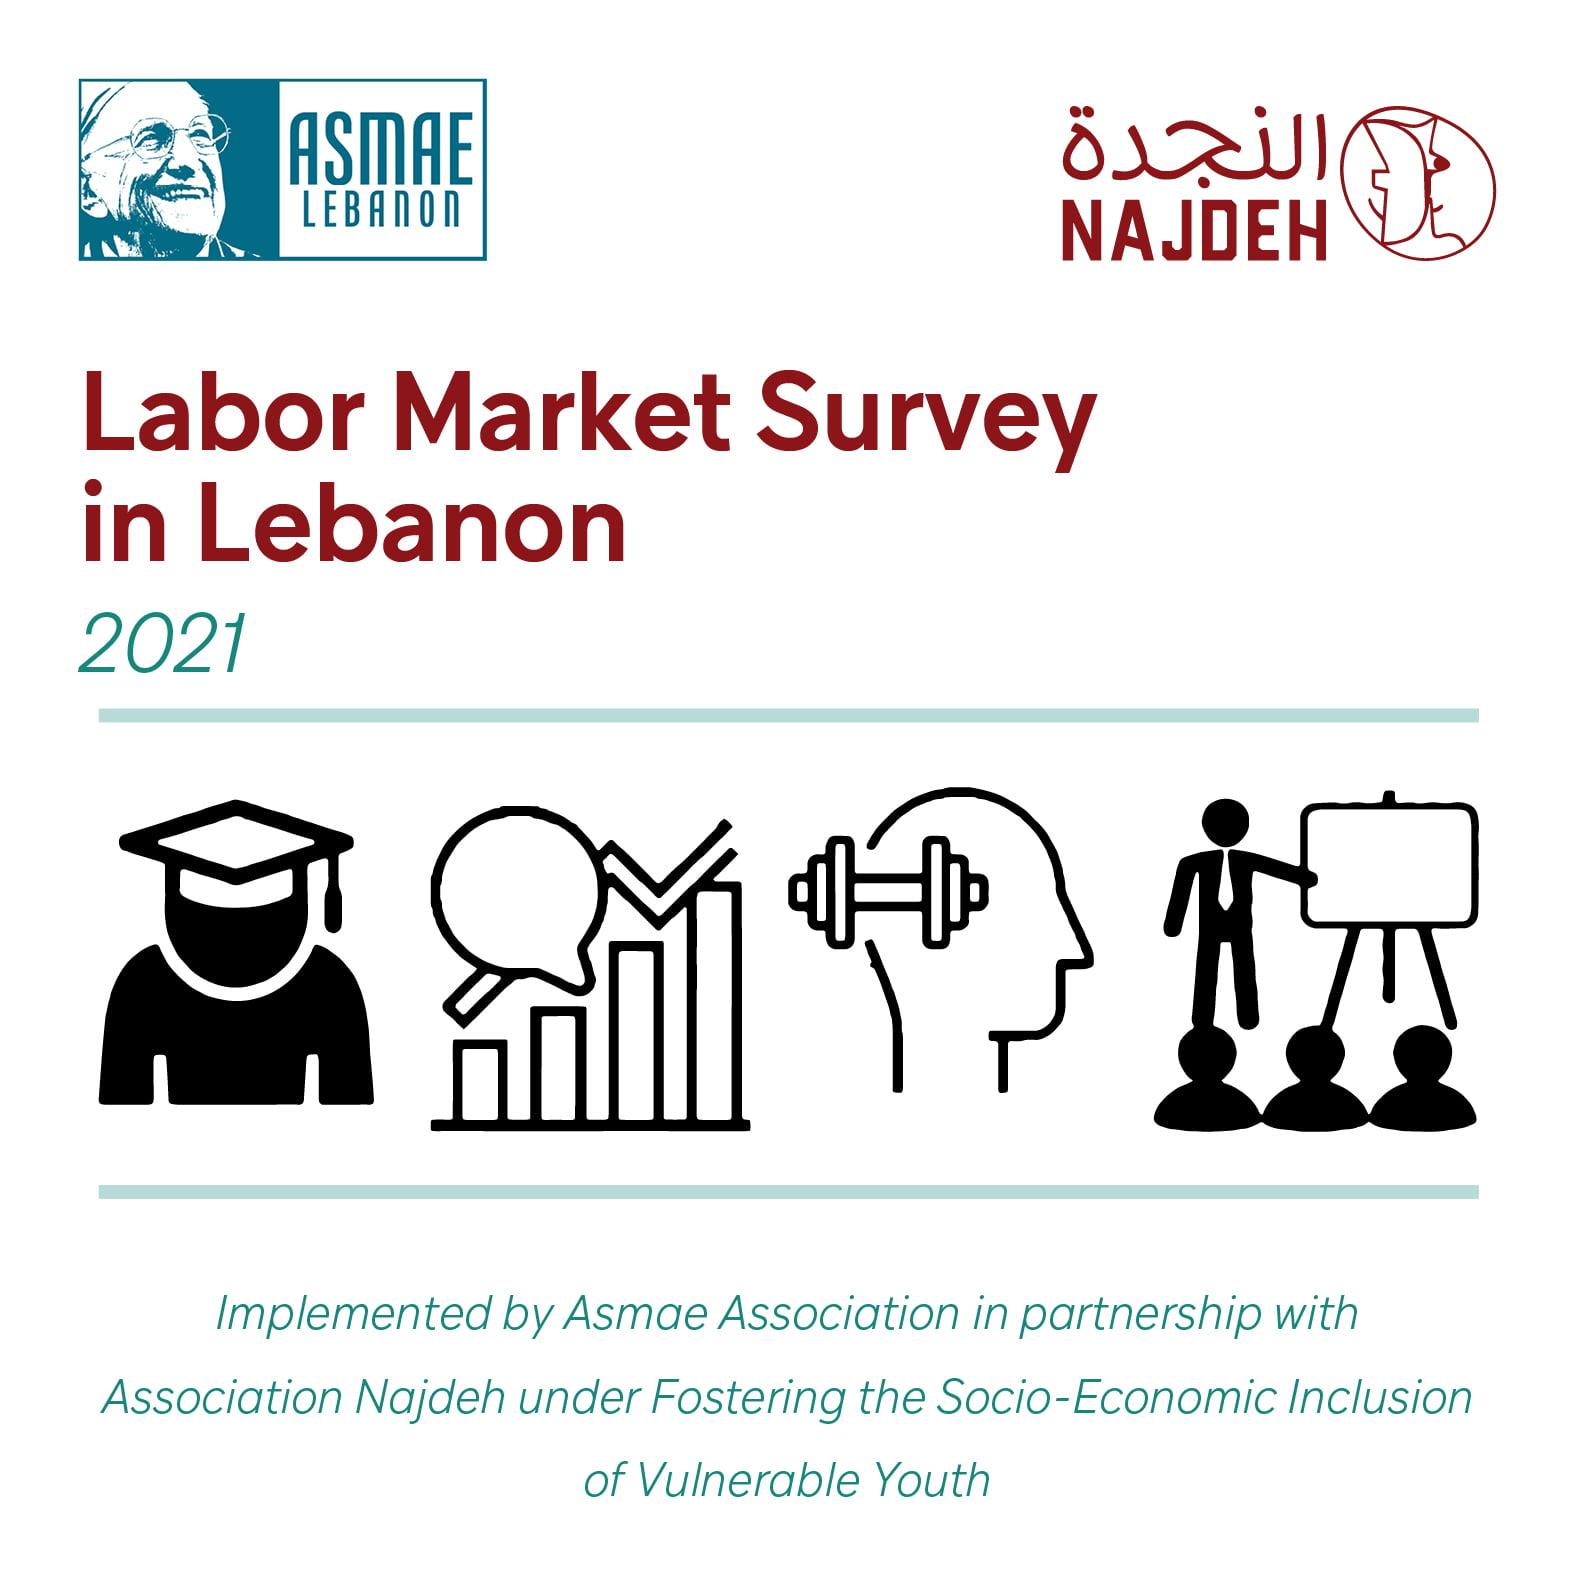 Labor Market Survey in Lebanon